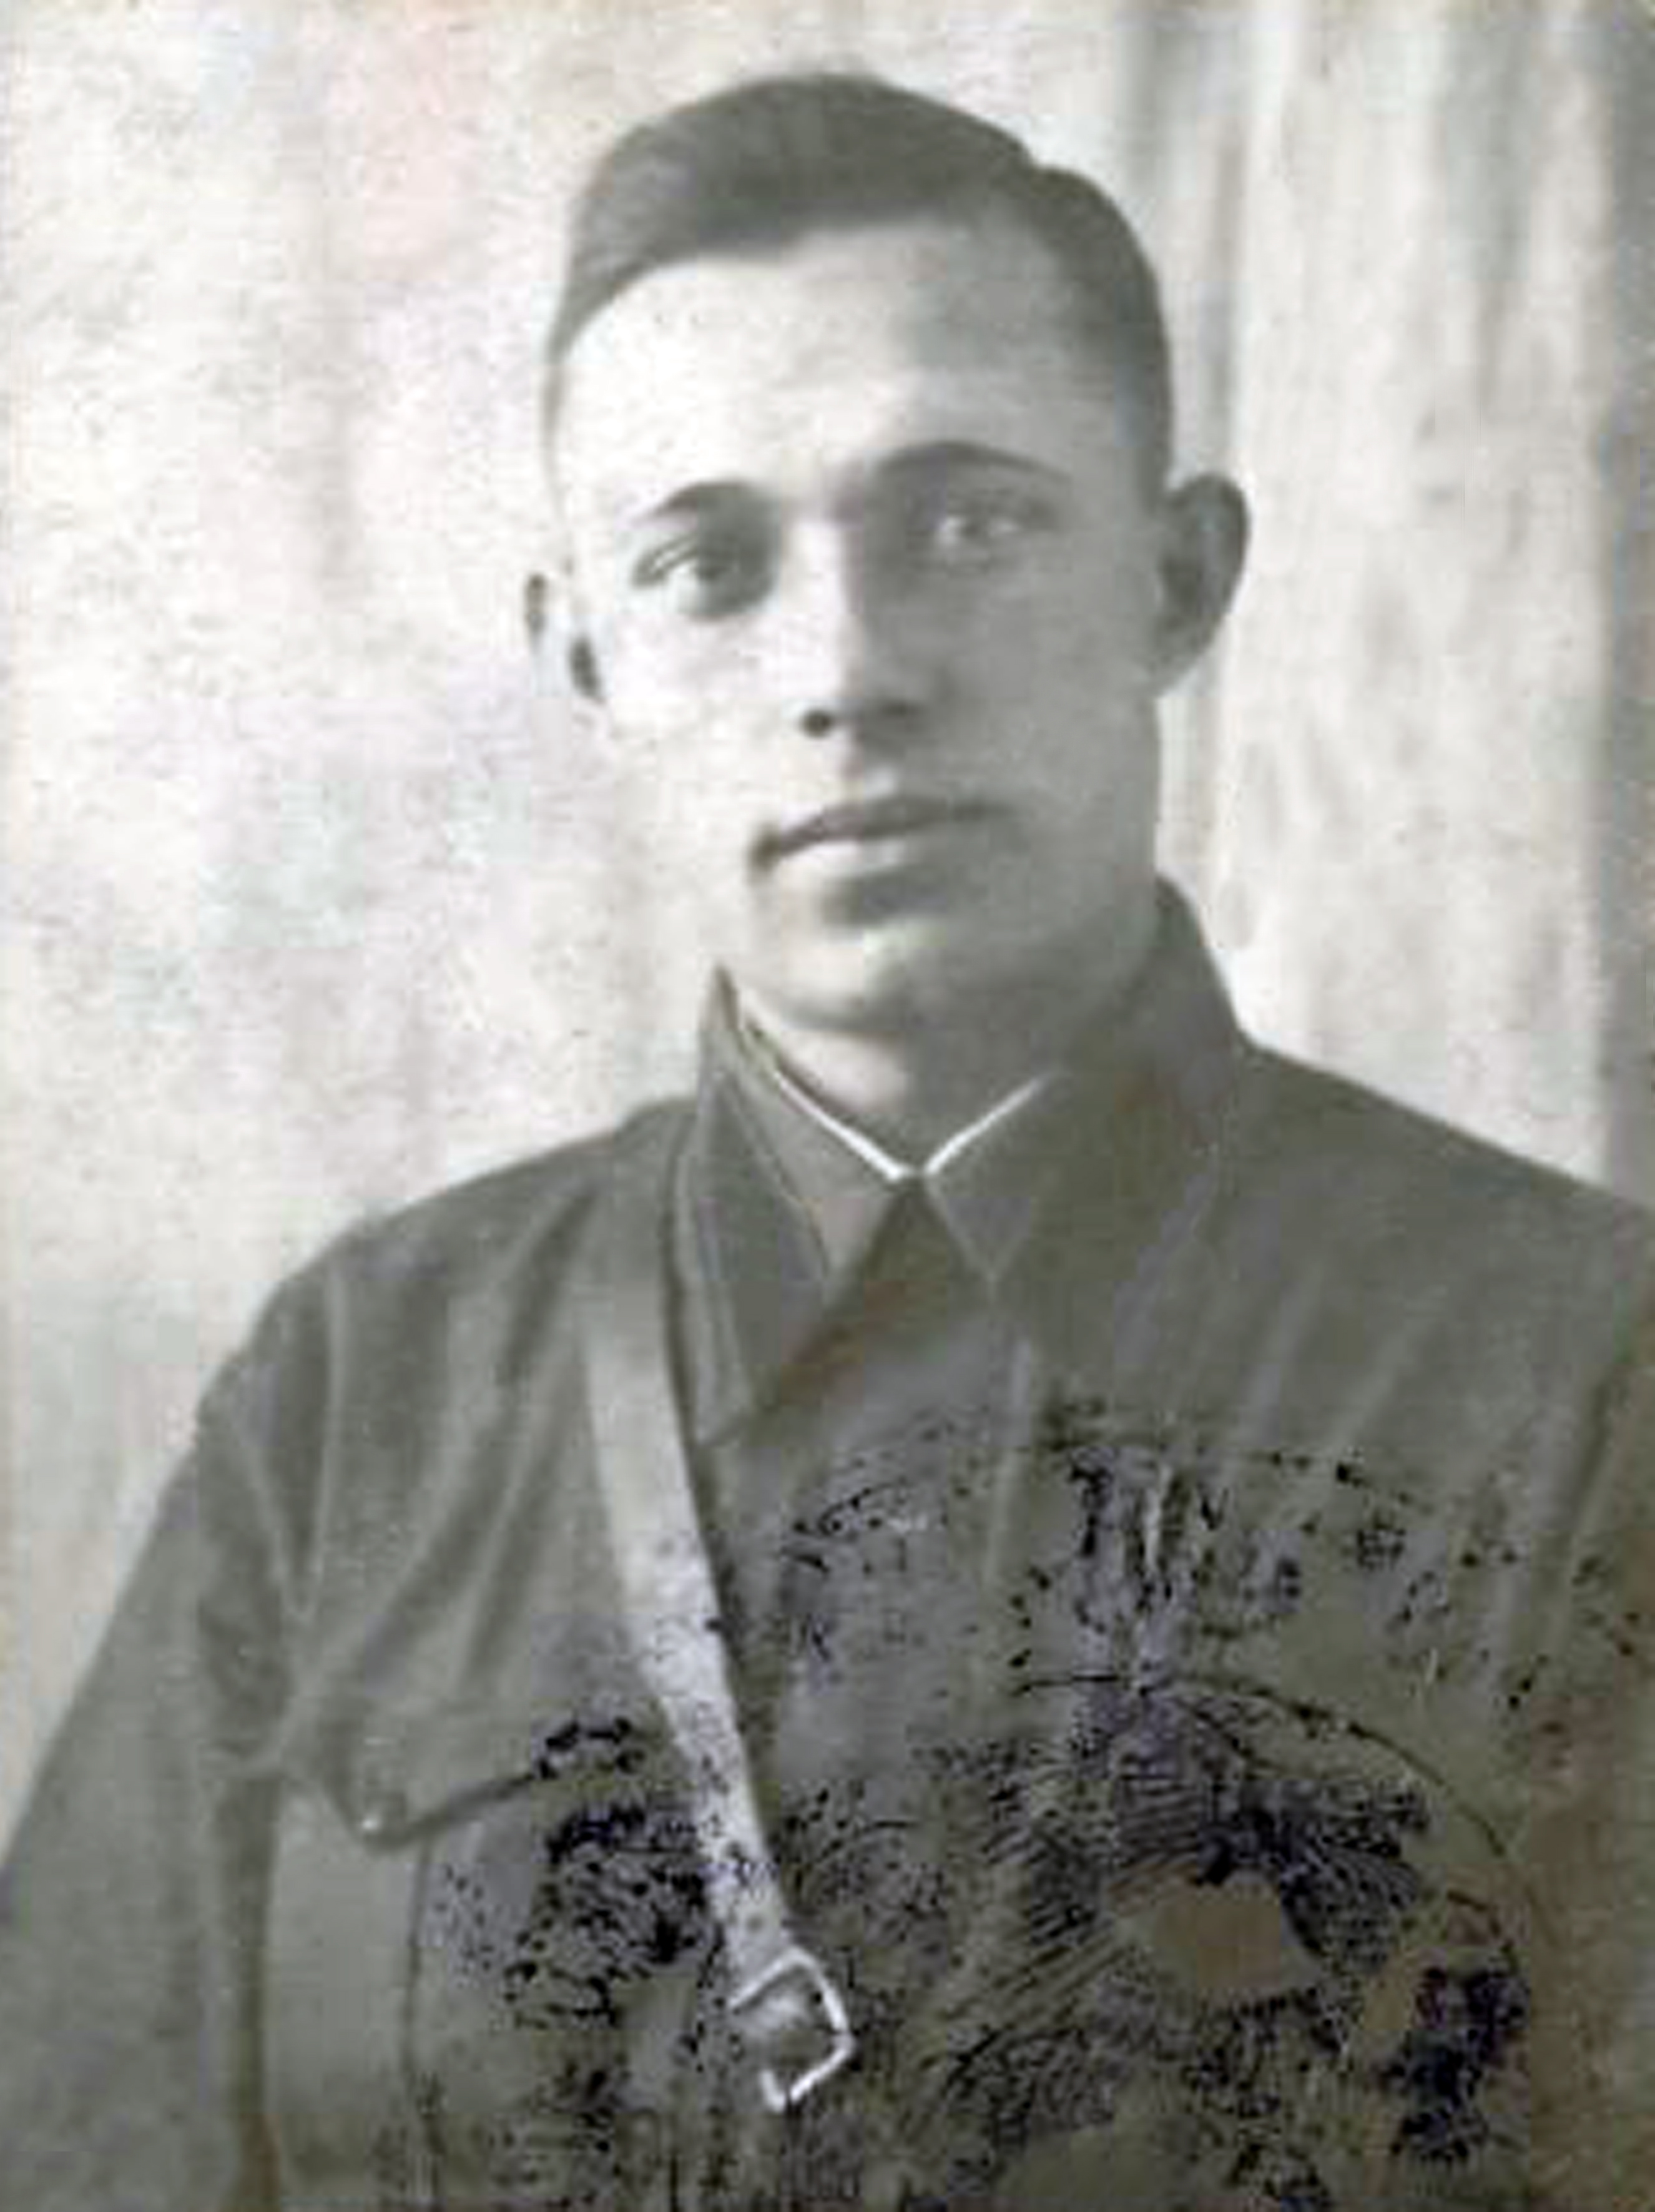 karabut-vladimir-illarionovich-boec-10-sd-vv.jpg